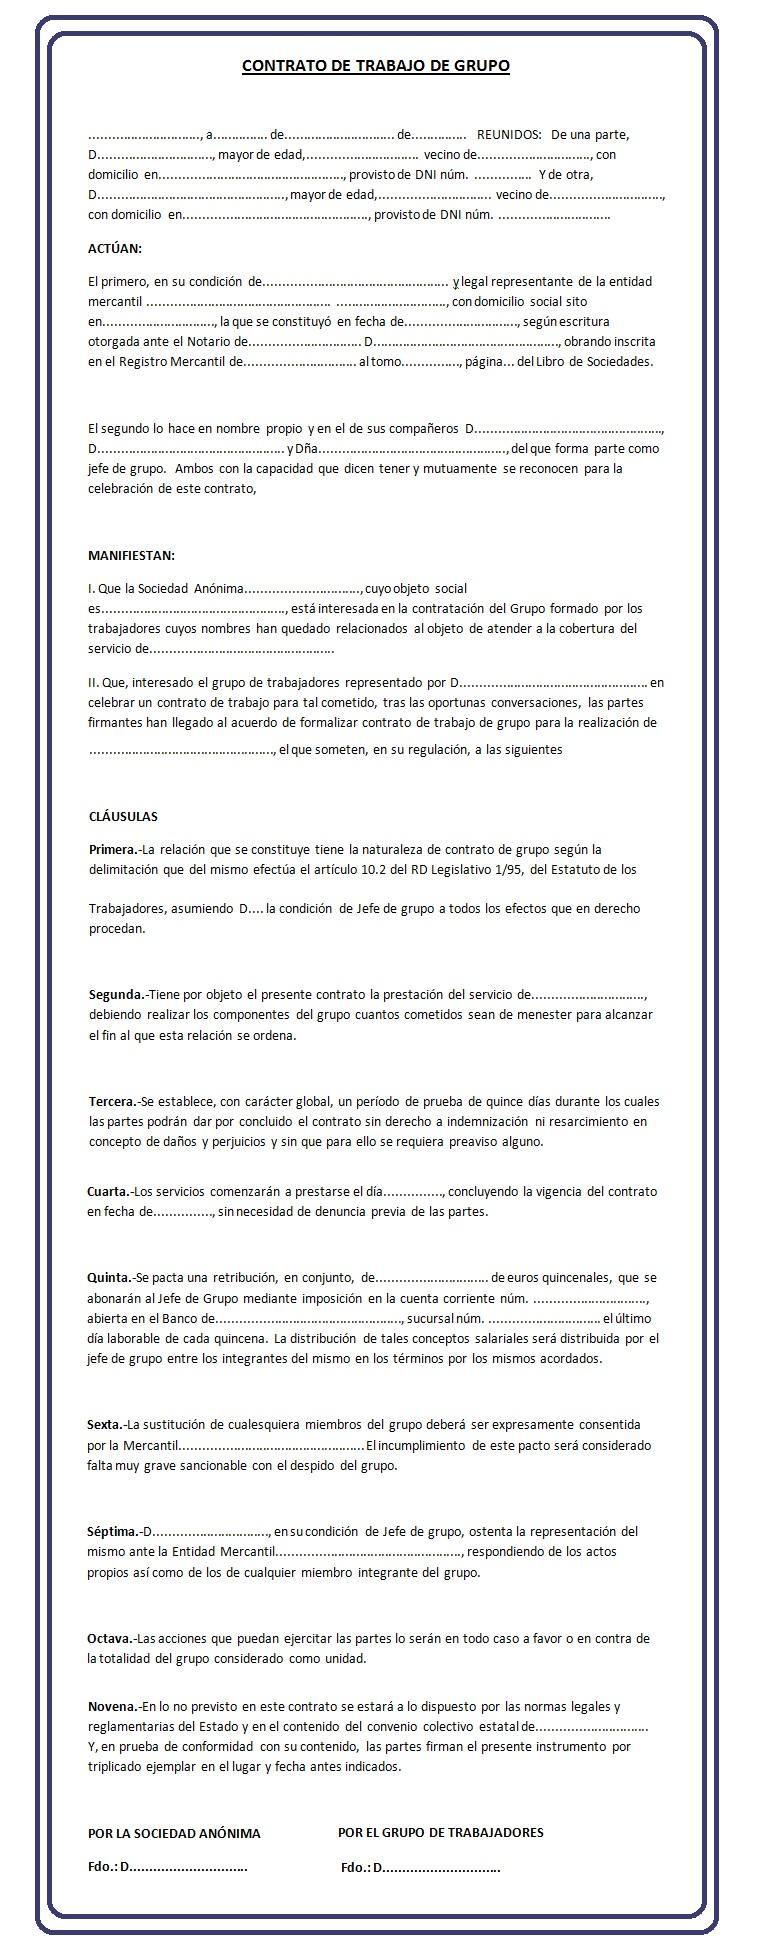 Modelo De Contrato De Trabajo Por Grupo Contrato Modelos Trabajo